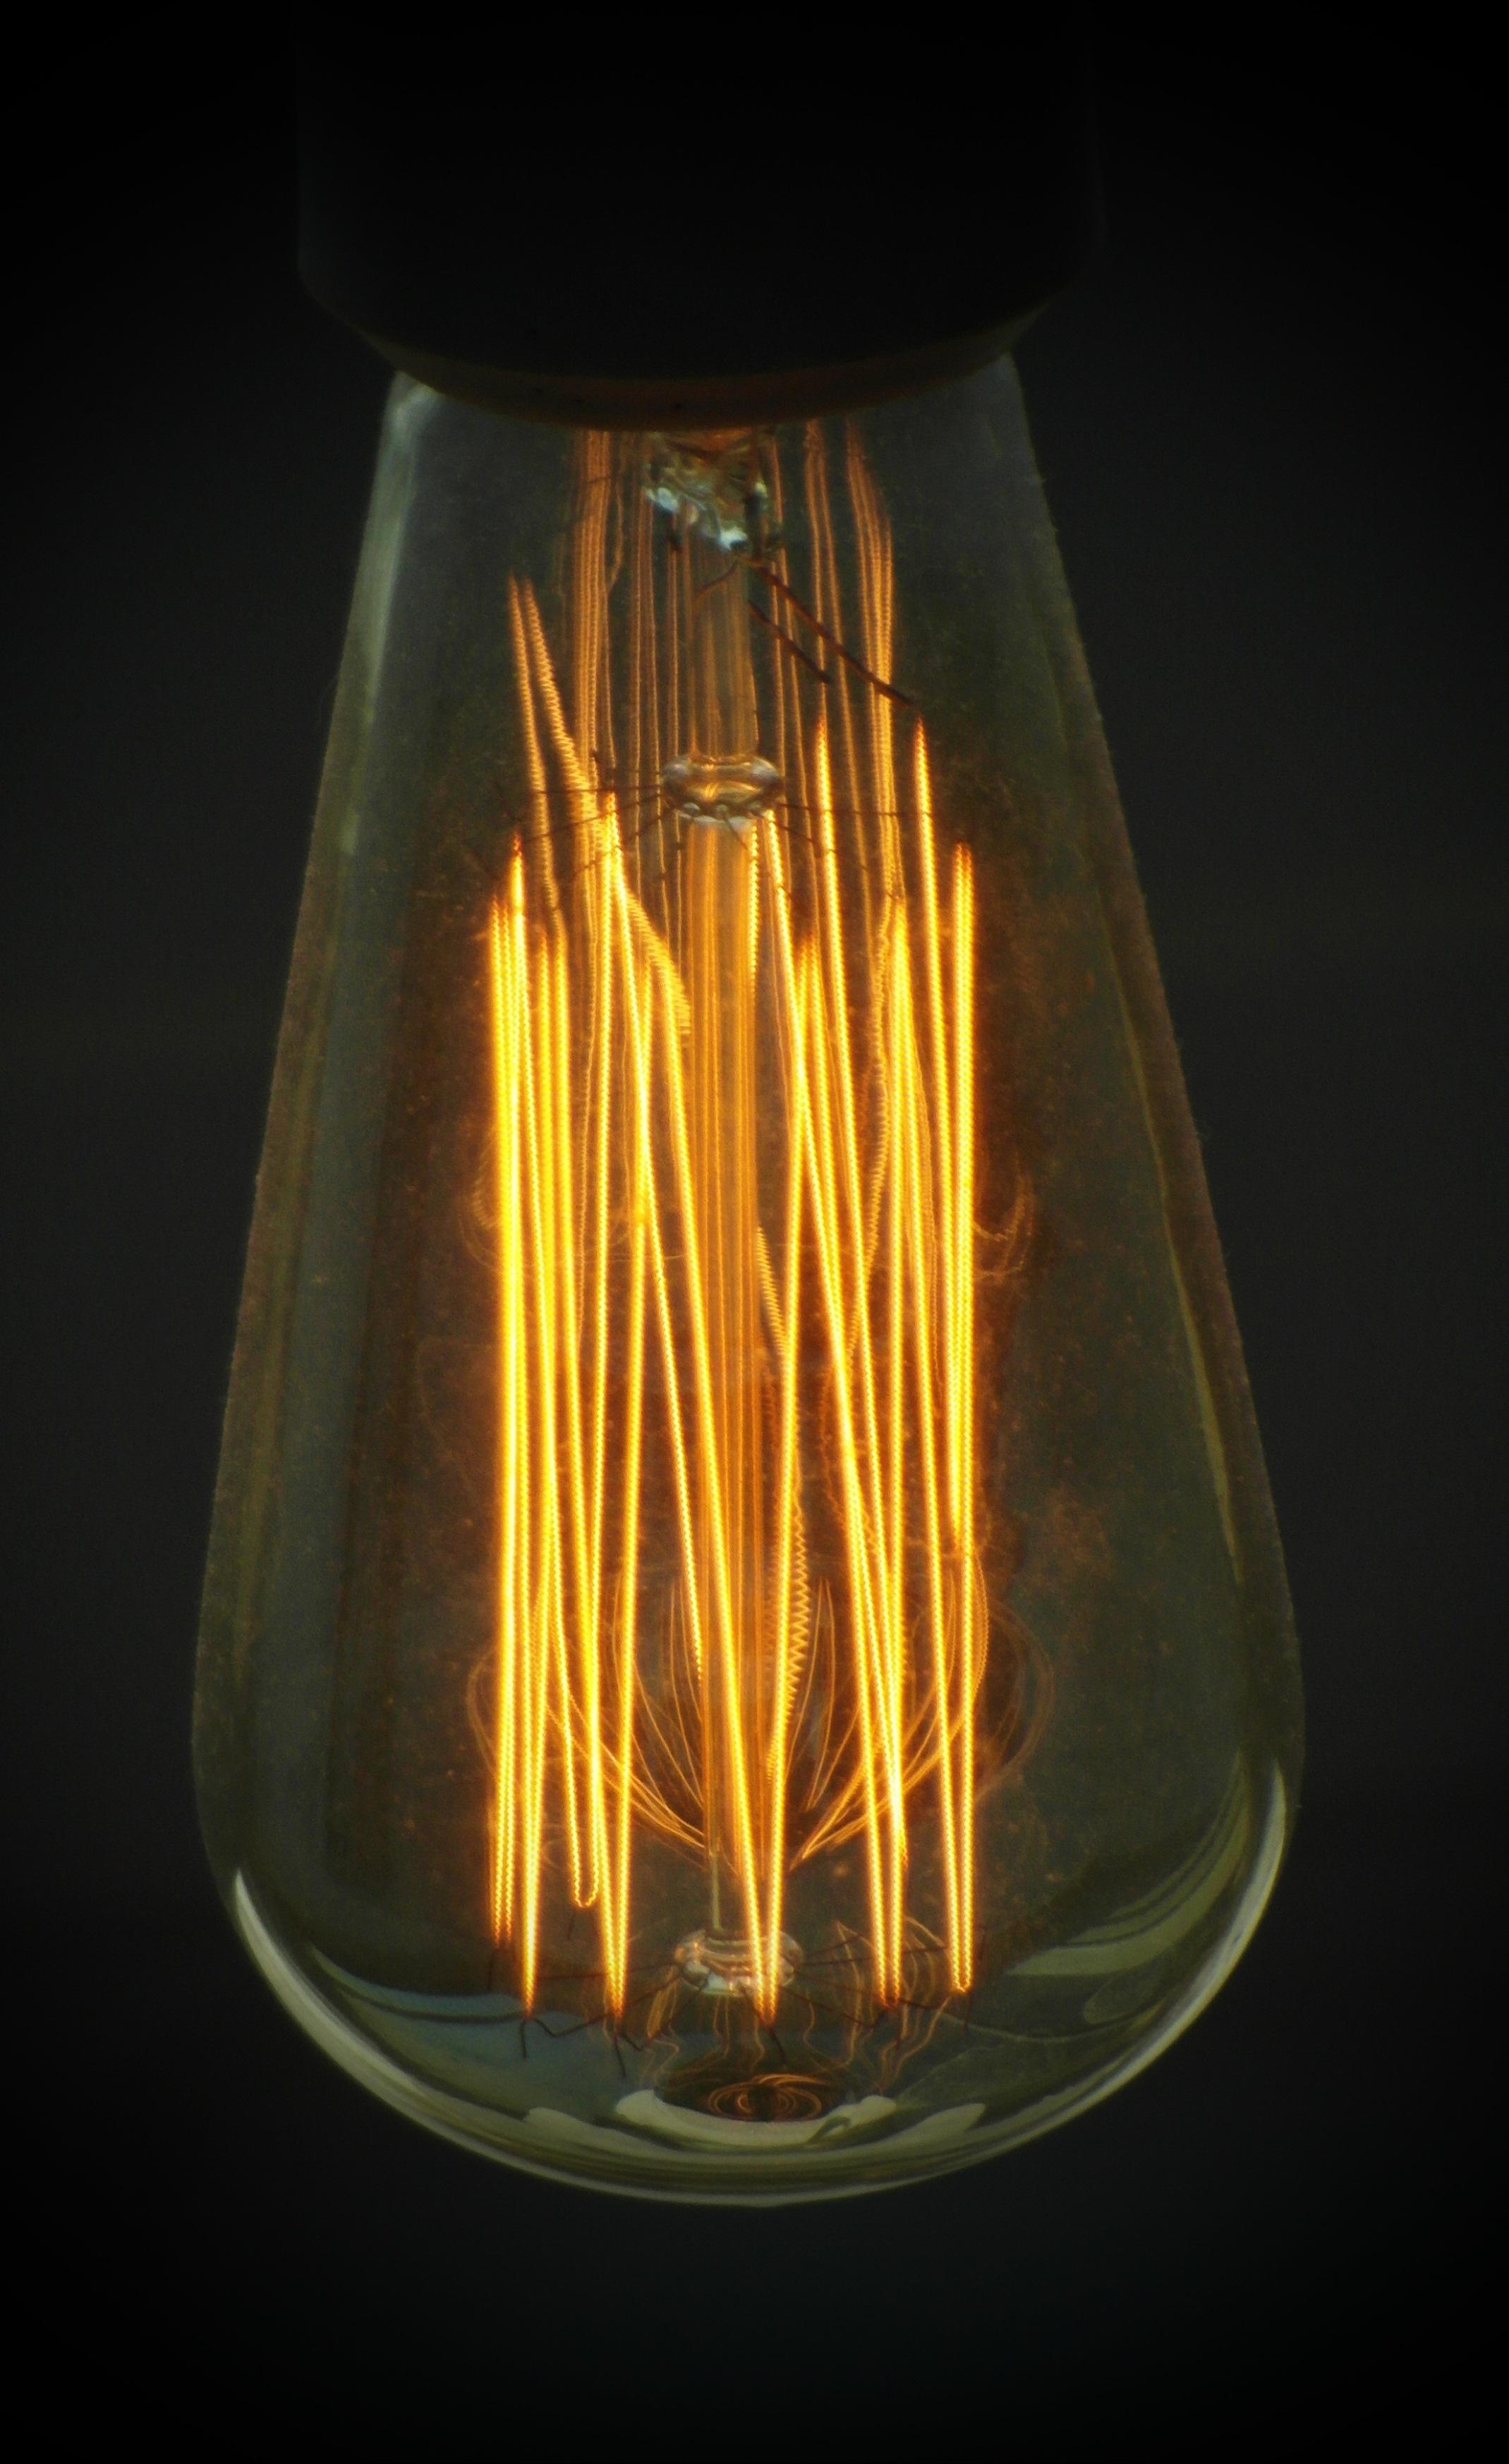 Edison light bulb photo